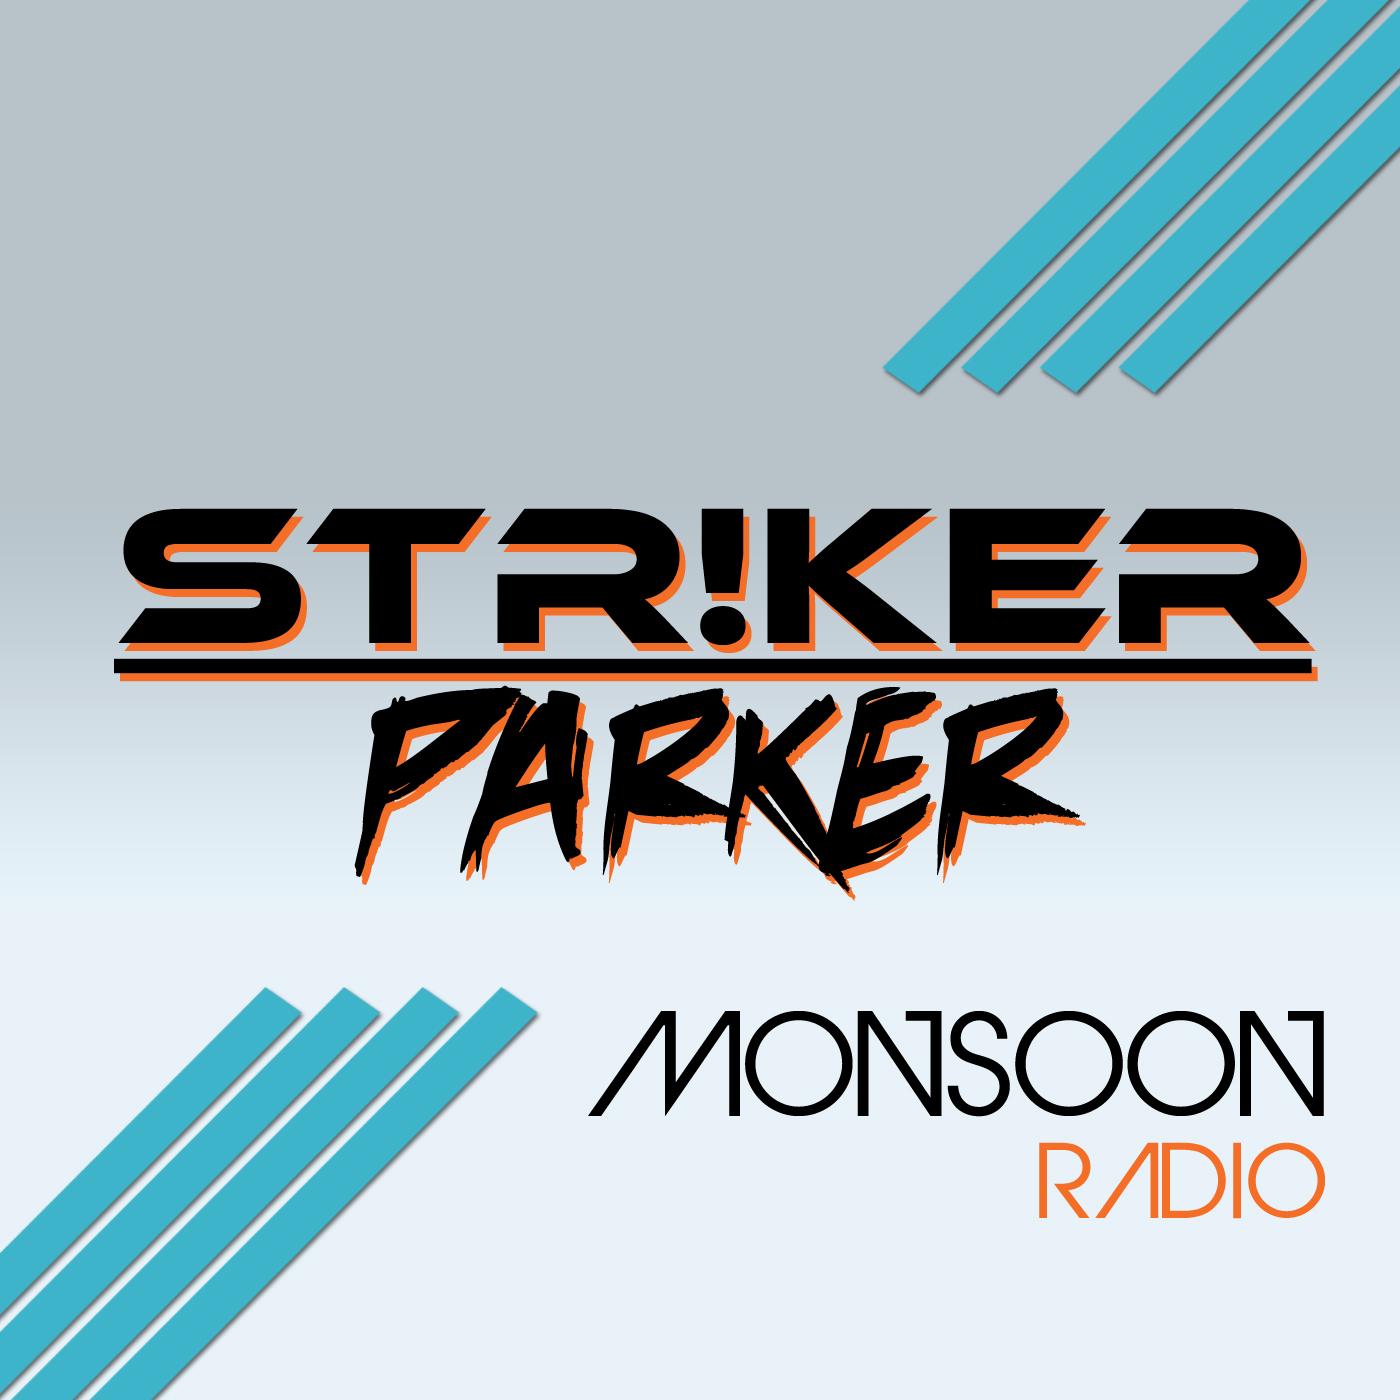 STR!KER & PARKER - Monsoon Radio